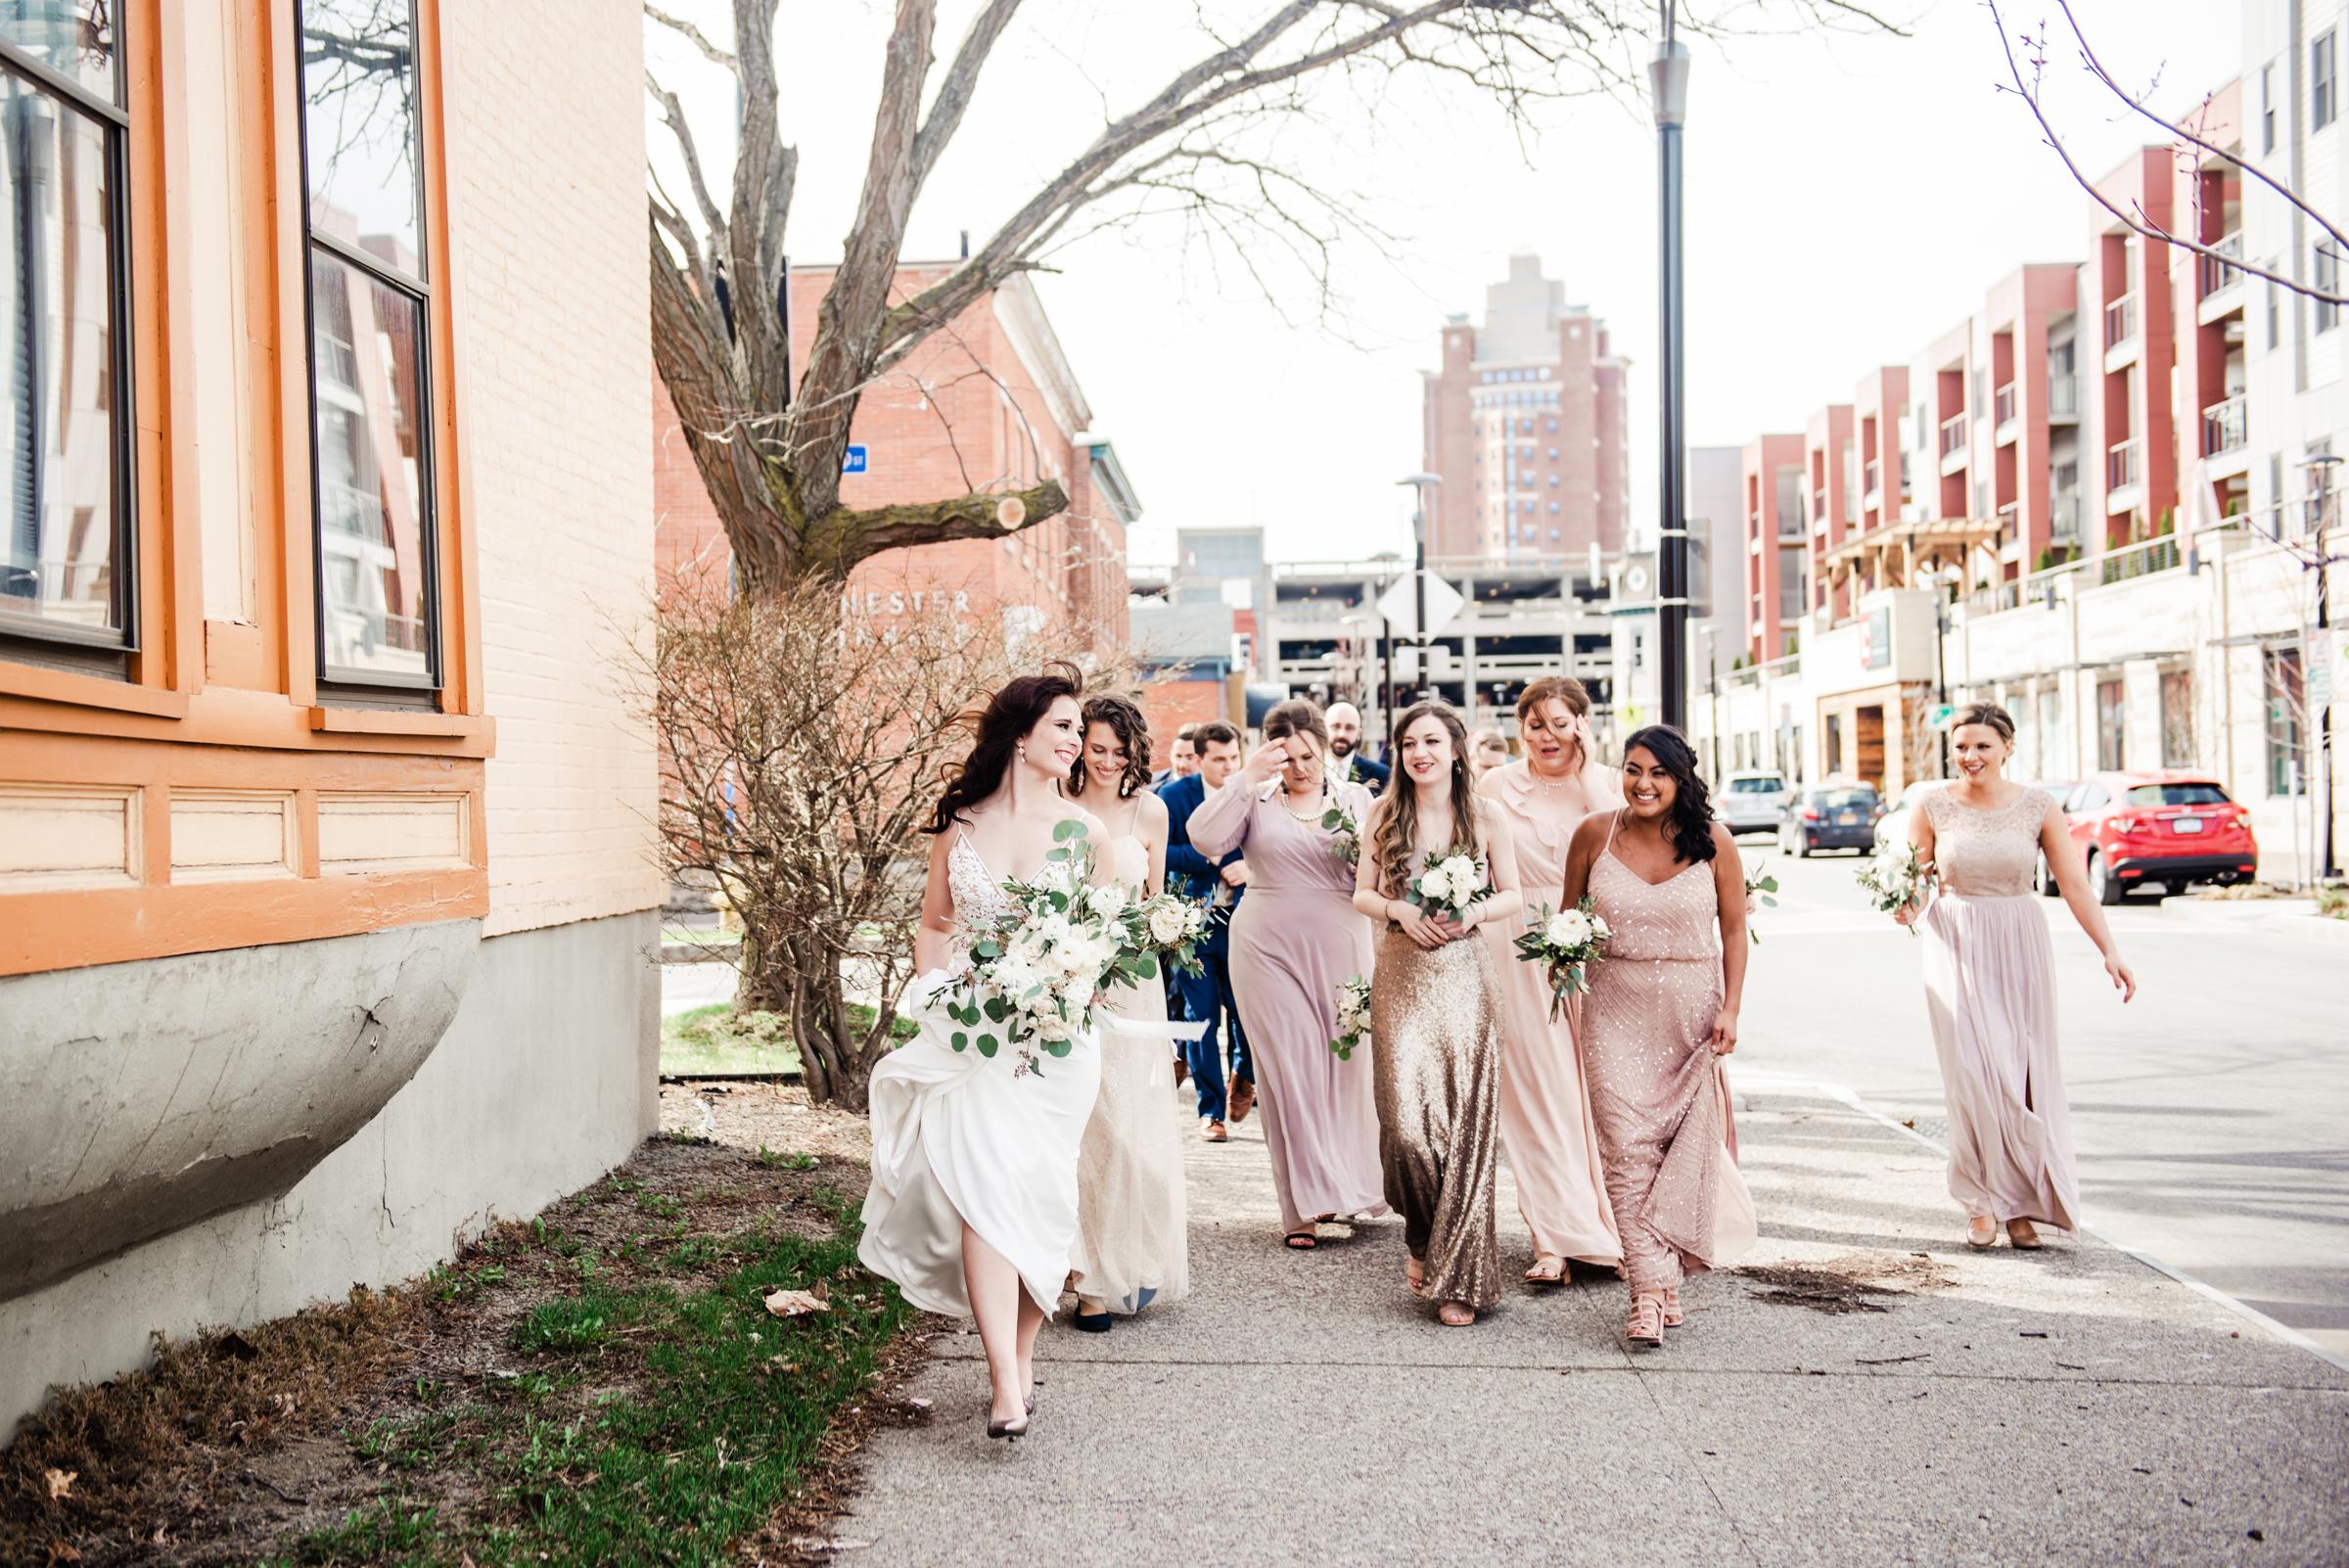 The_Arbor_LoftRochester_Wedding_JILL_STUDIO_Rochester_NY_Photographer_155226.jpg